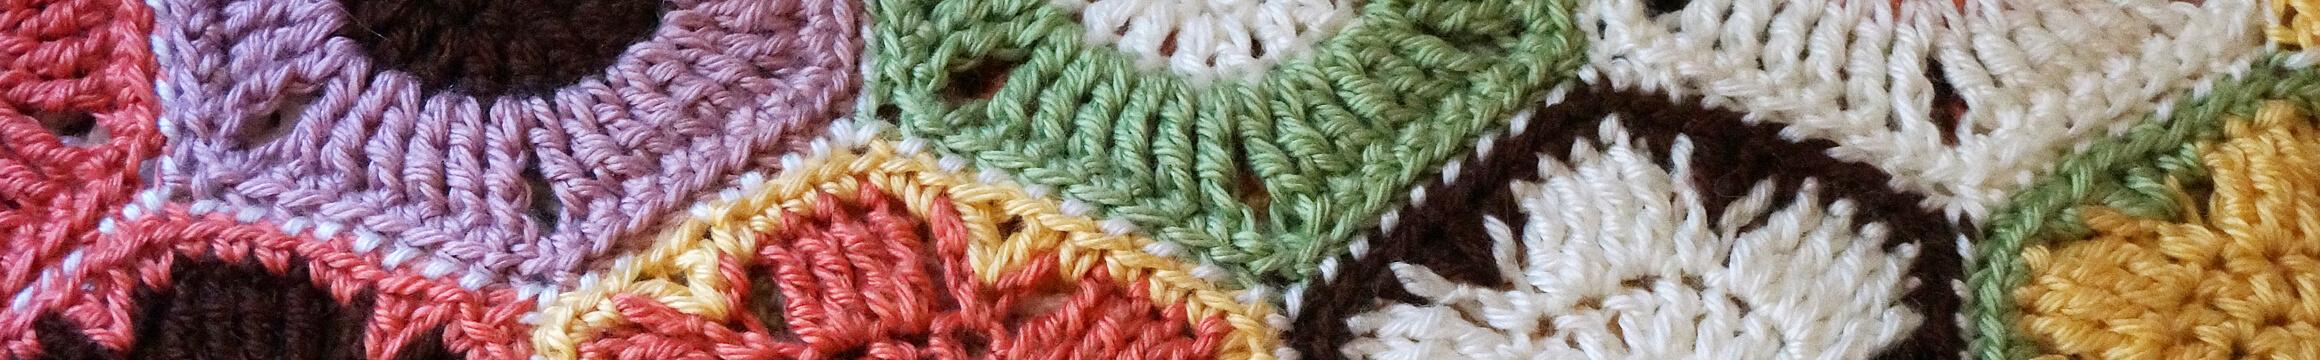 Crochet 03